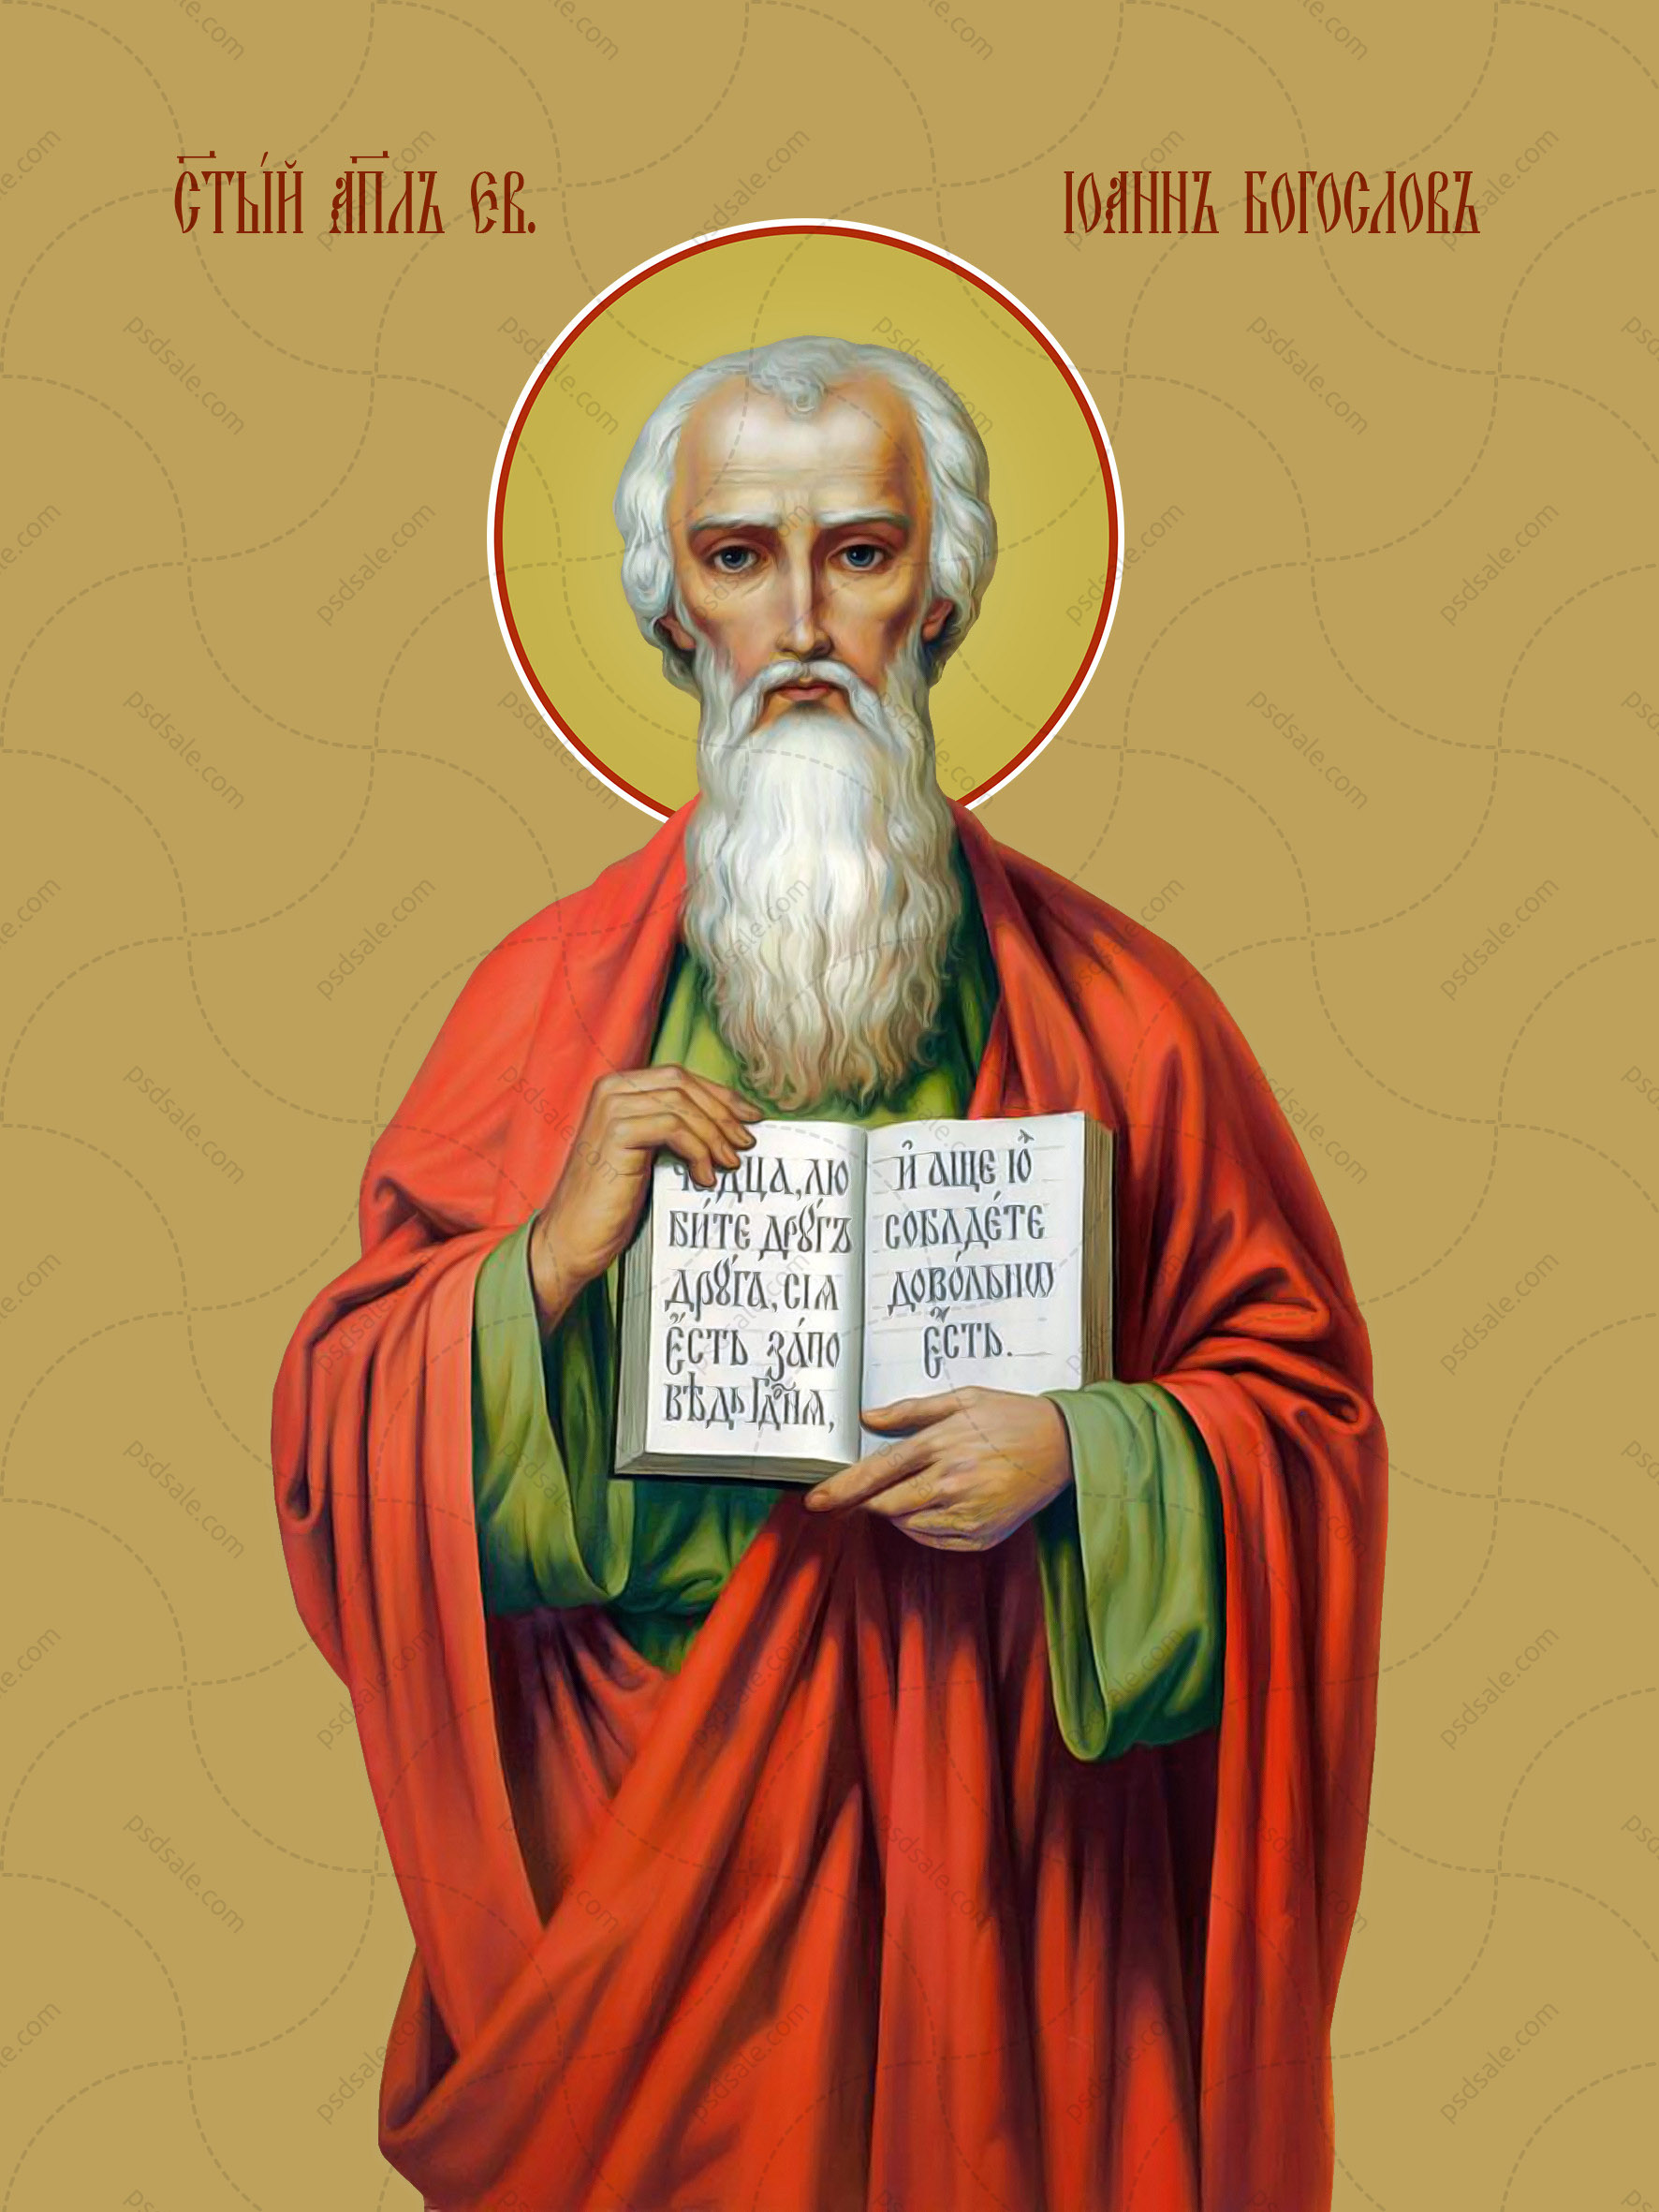 Иоанн Богослов, евангелист